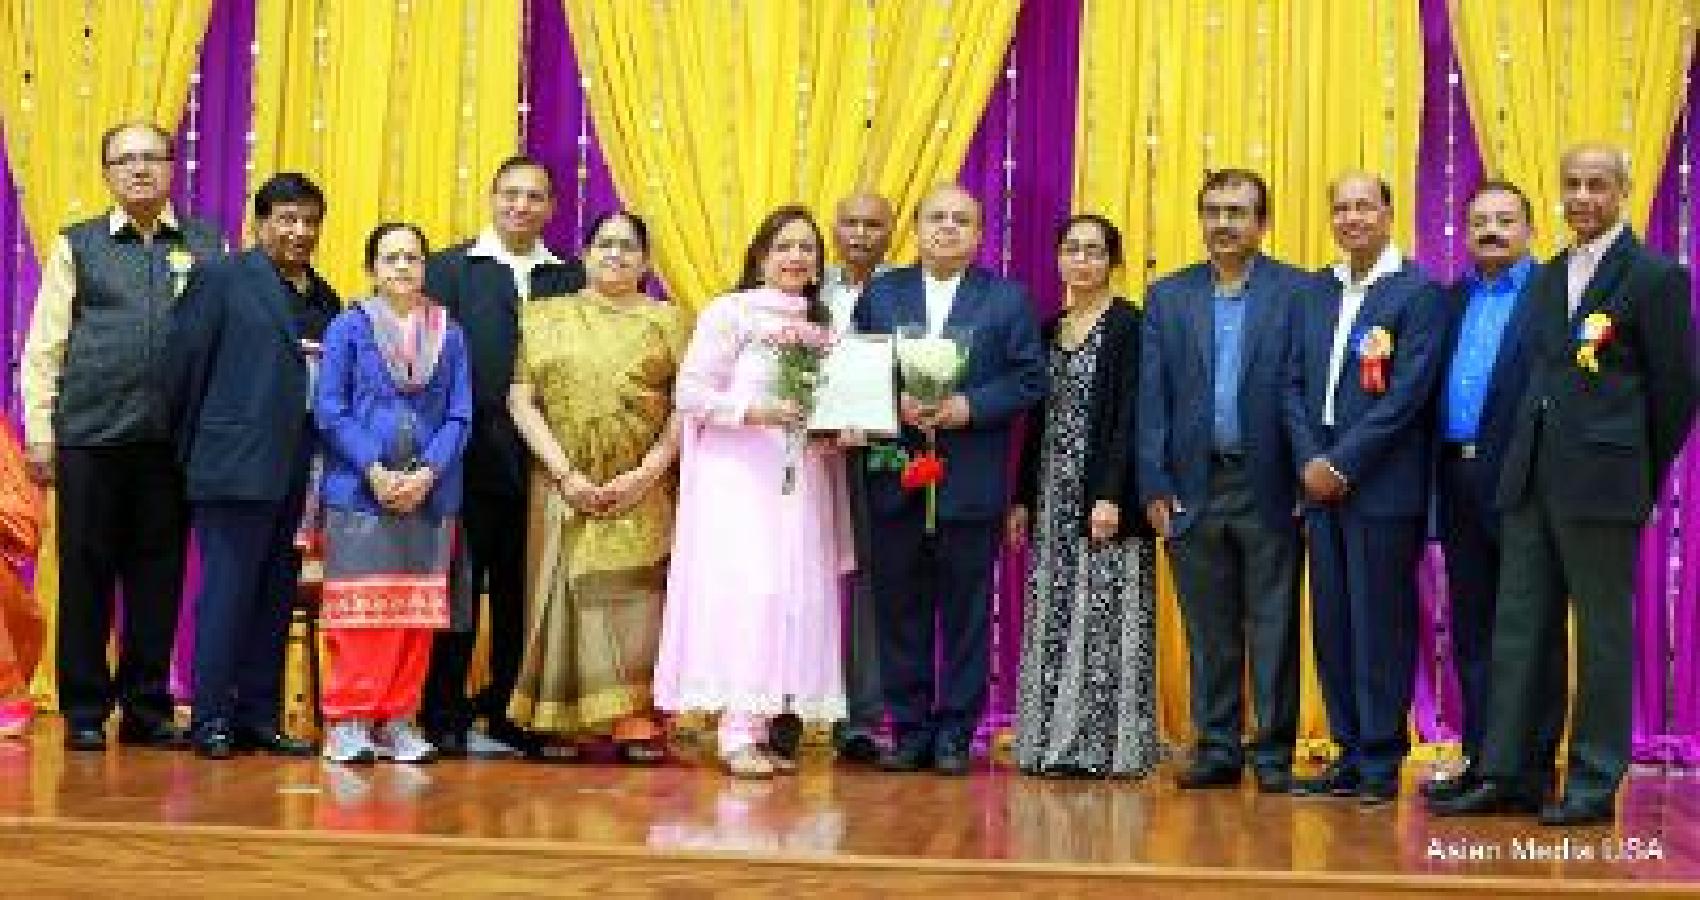 Gujarati Seniors of Chicago Honor Dr. Mehboob Kapadia for Covid-19 Vaccination Camps